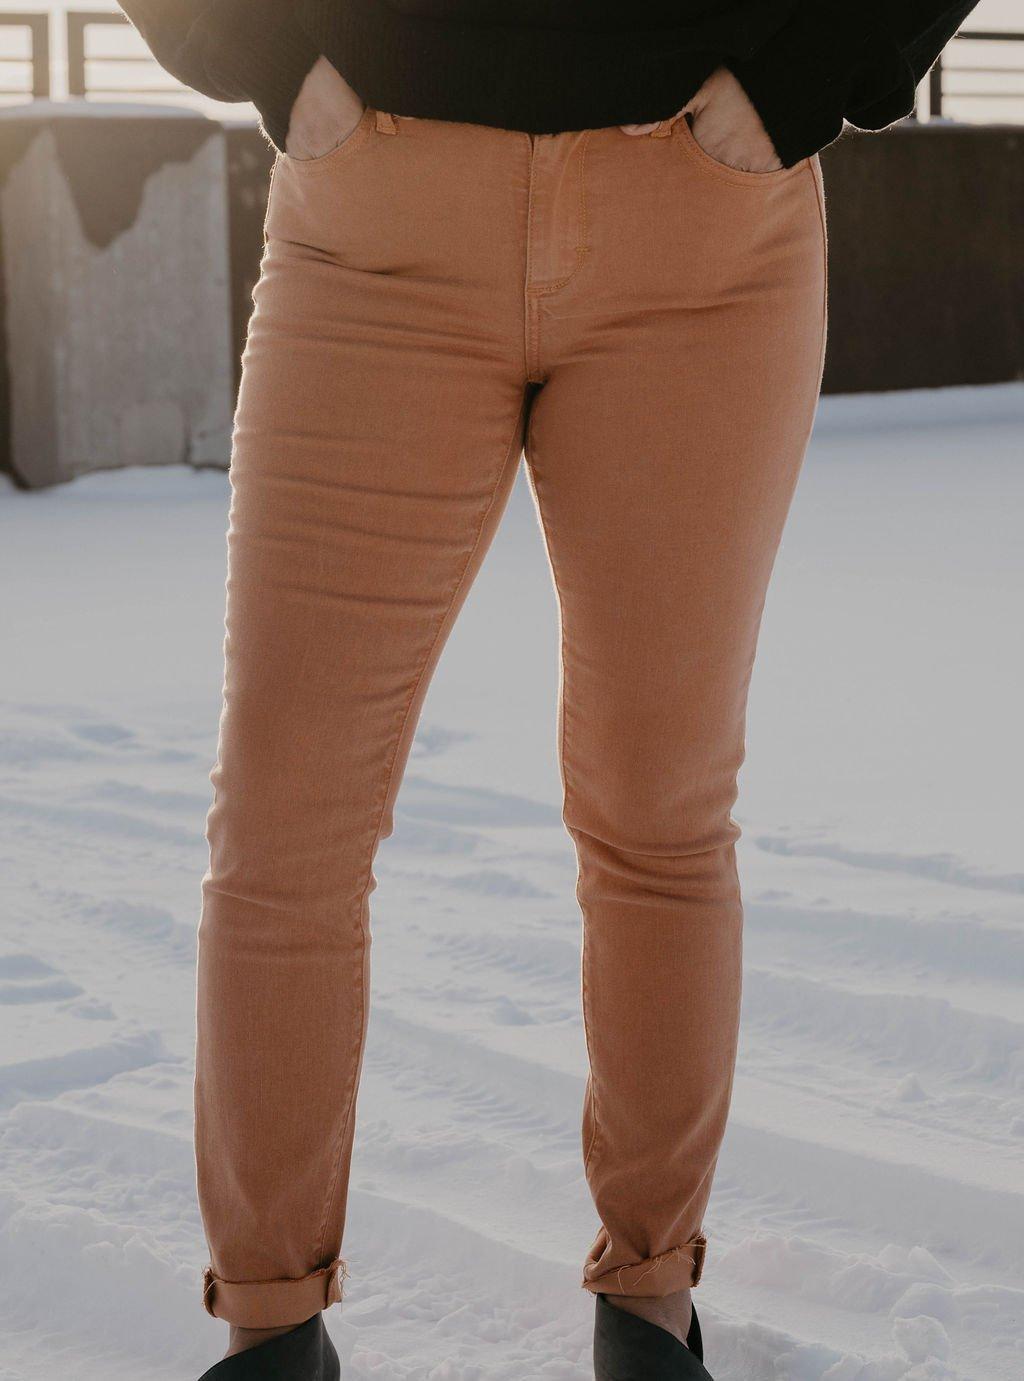 Cello Chestnut Skinny Straight Cut Pant